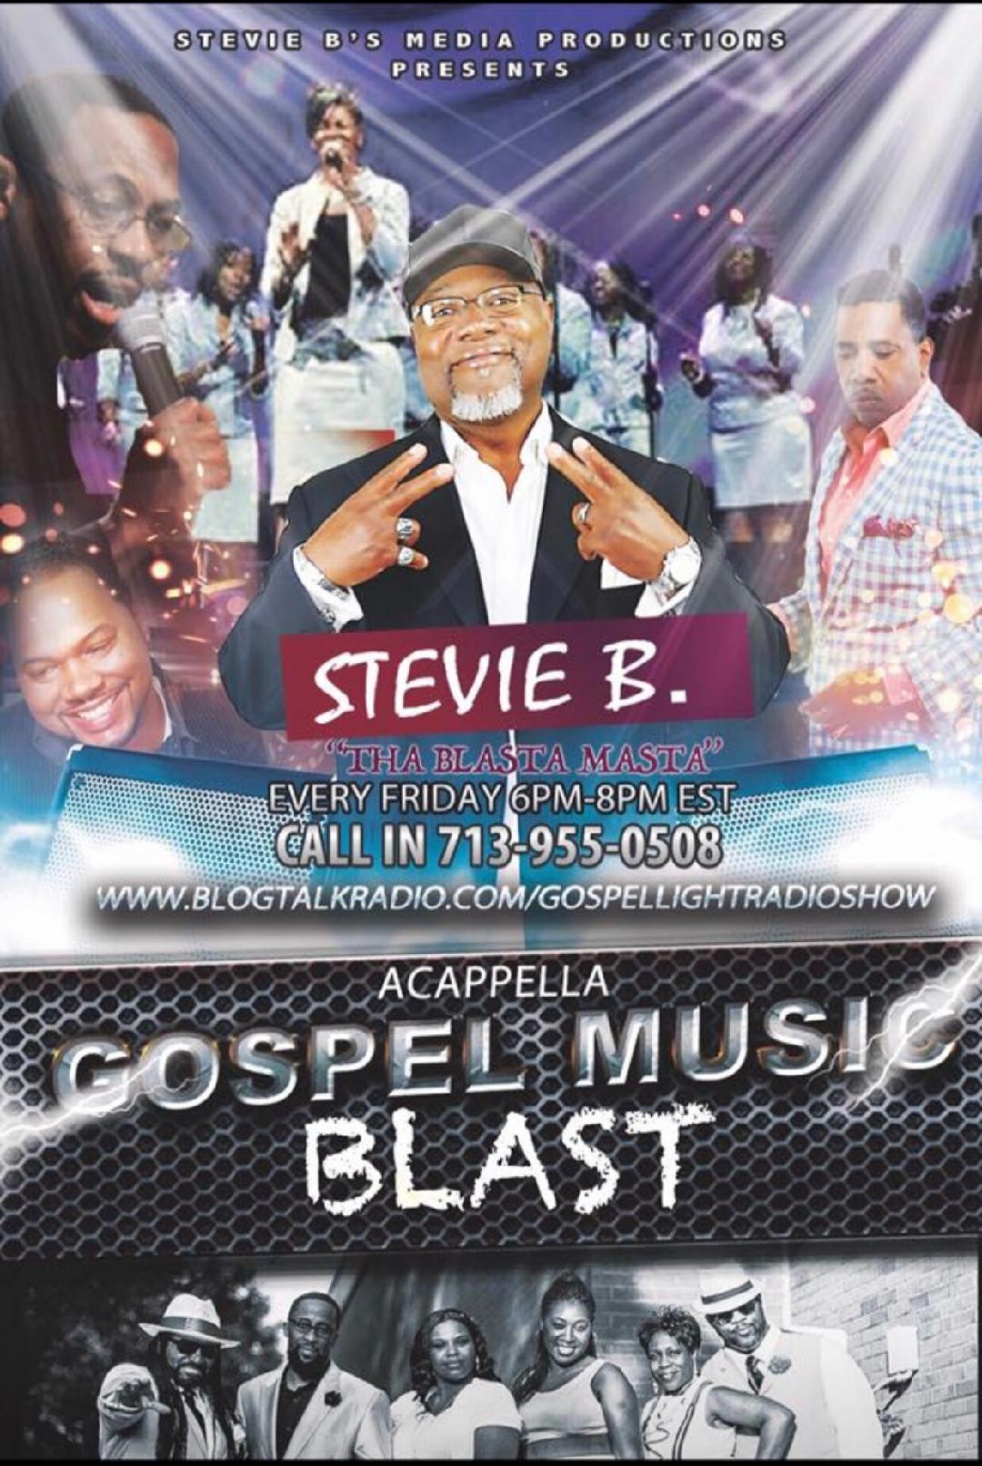 Stevie B. Media Productions - immagine di copertina